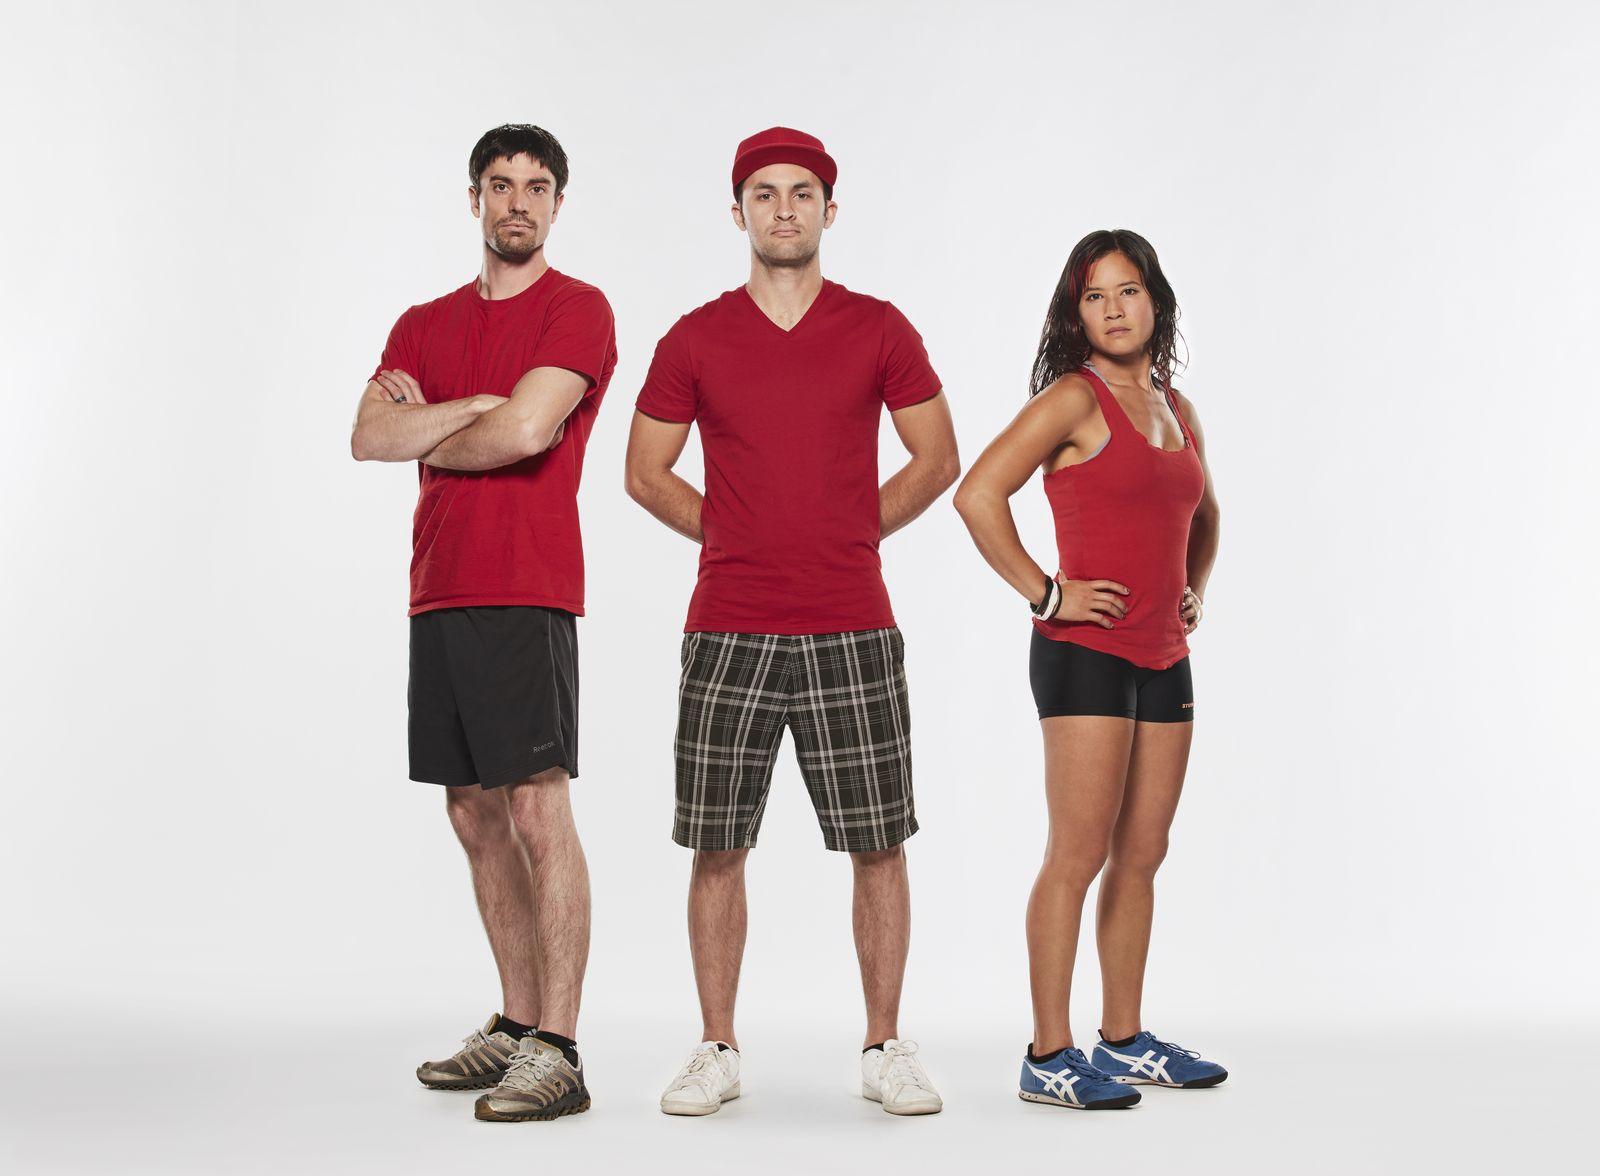 ballers season 3 episode 8 wiki